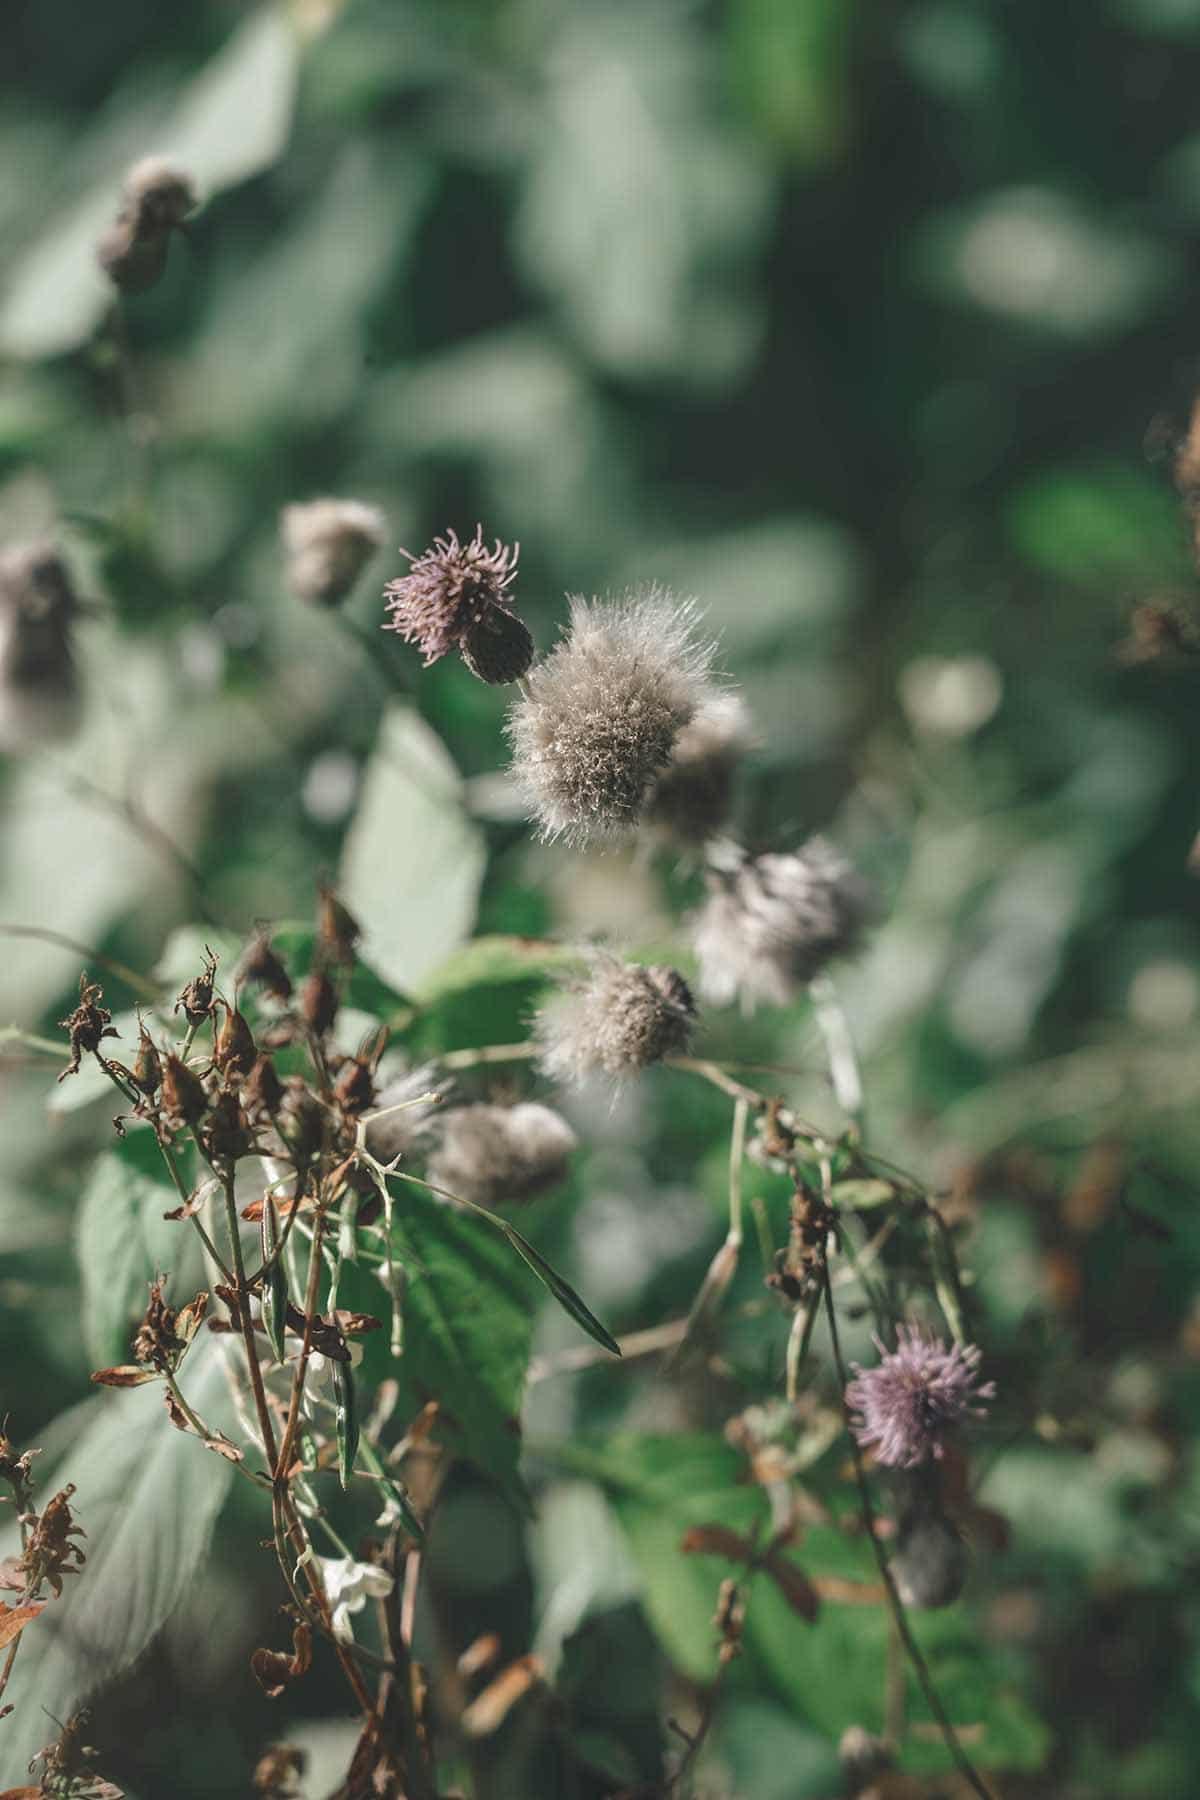 wandern-donausteig-schloegener-schlinge-pflanze-makro